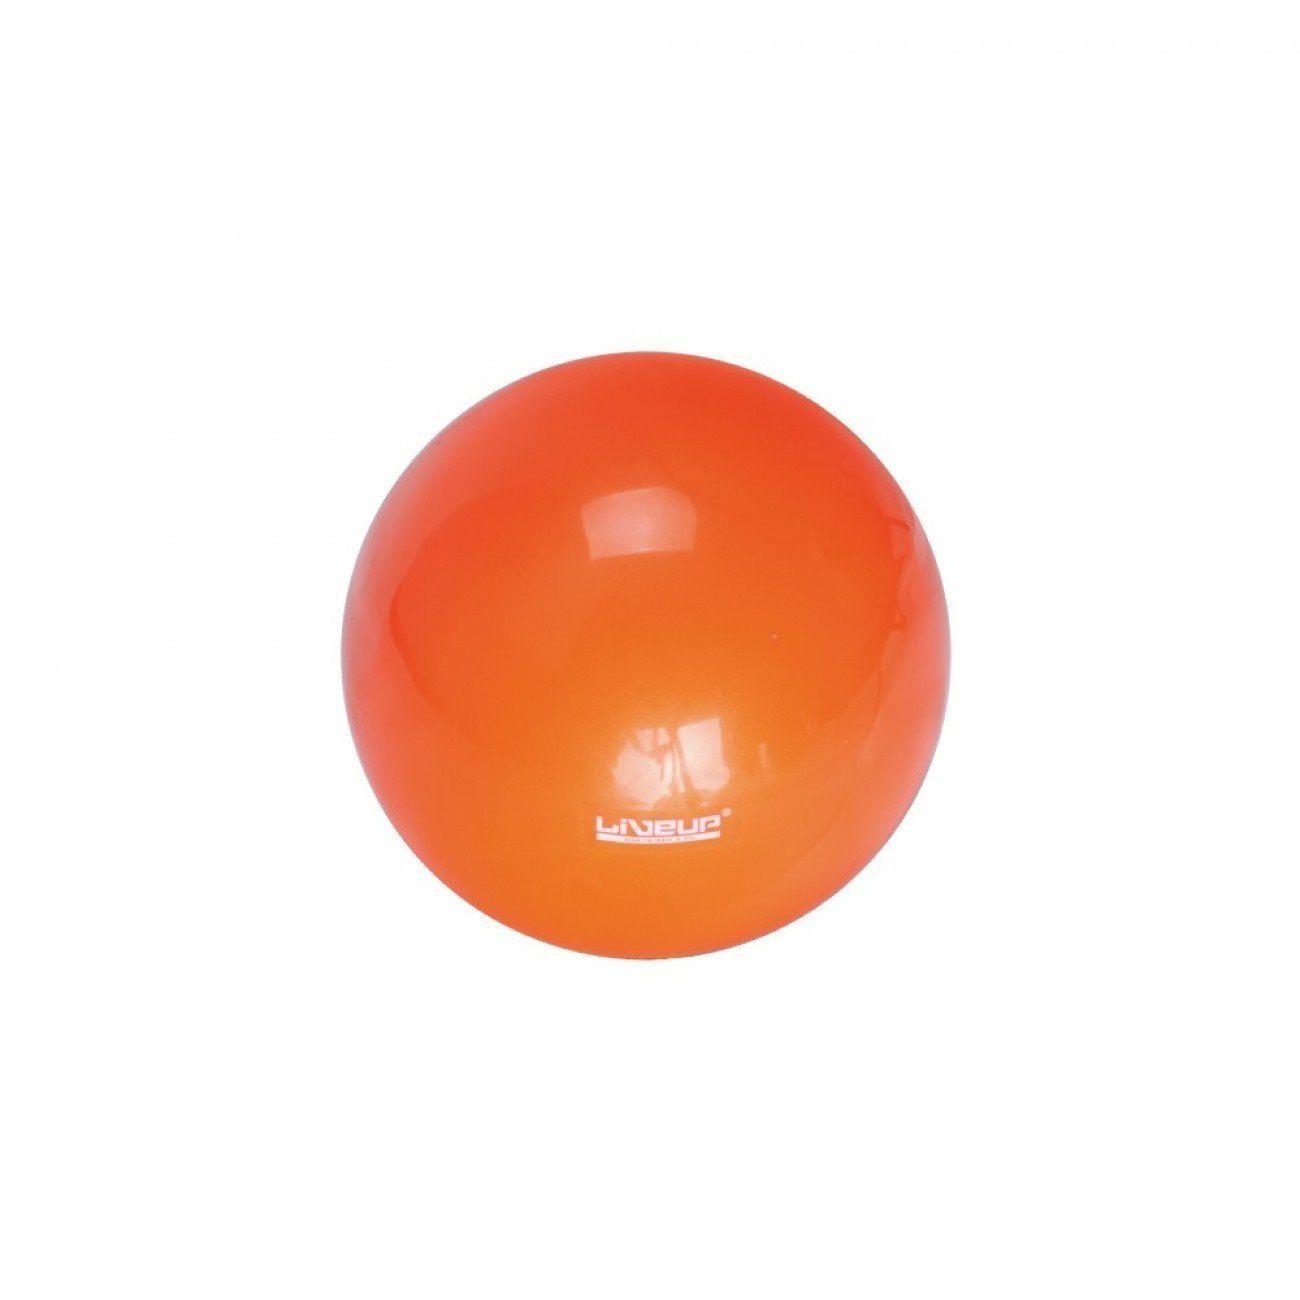 Kit 12 Overball 25cm Circunferencia Cor Laranja Liveup